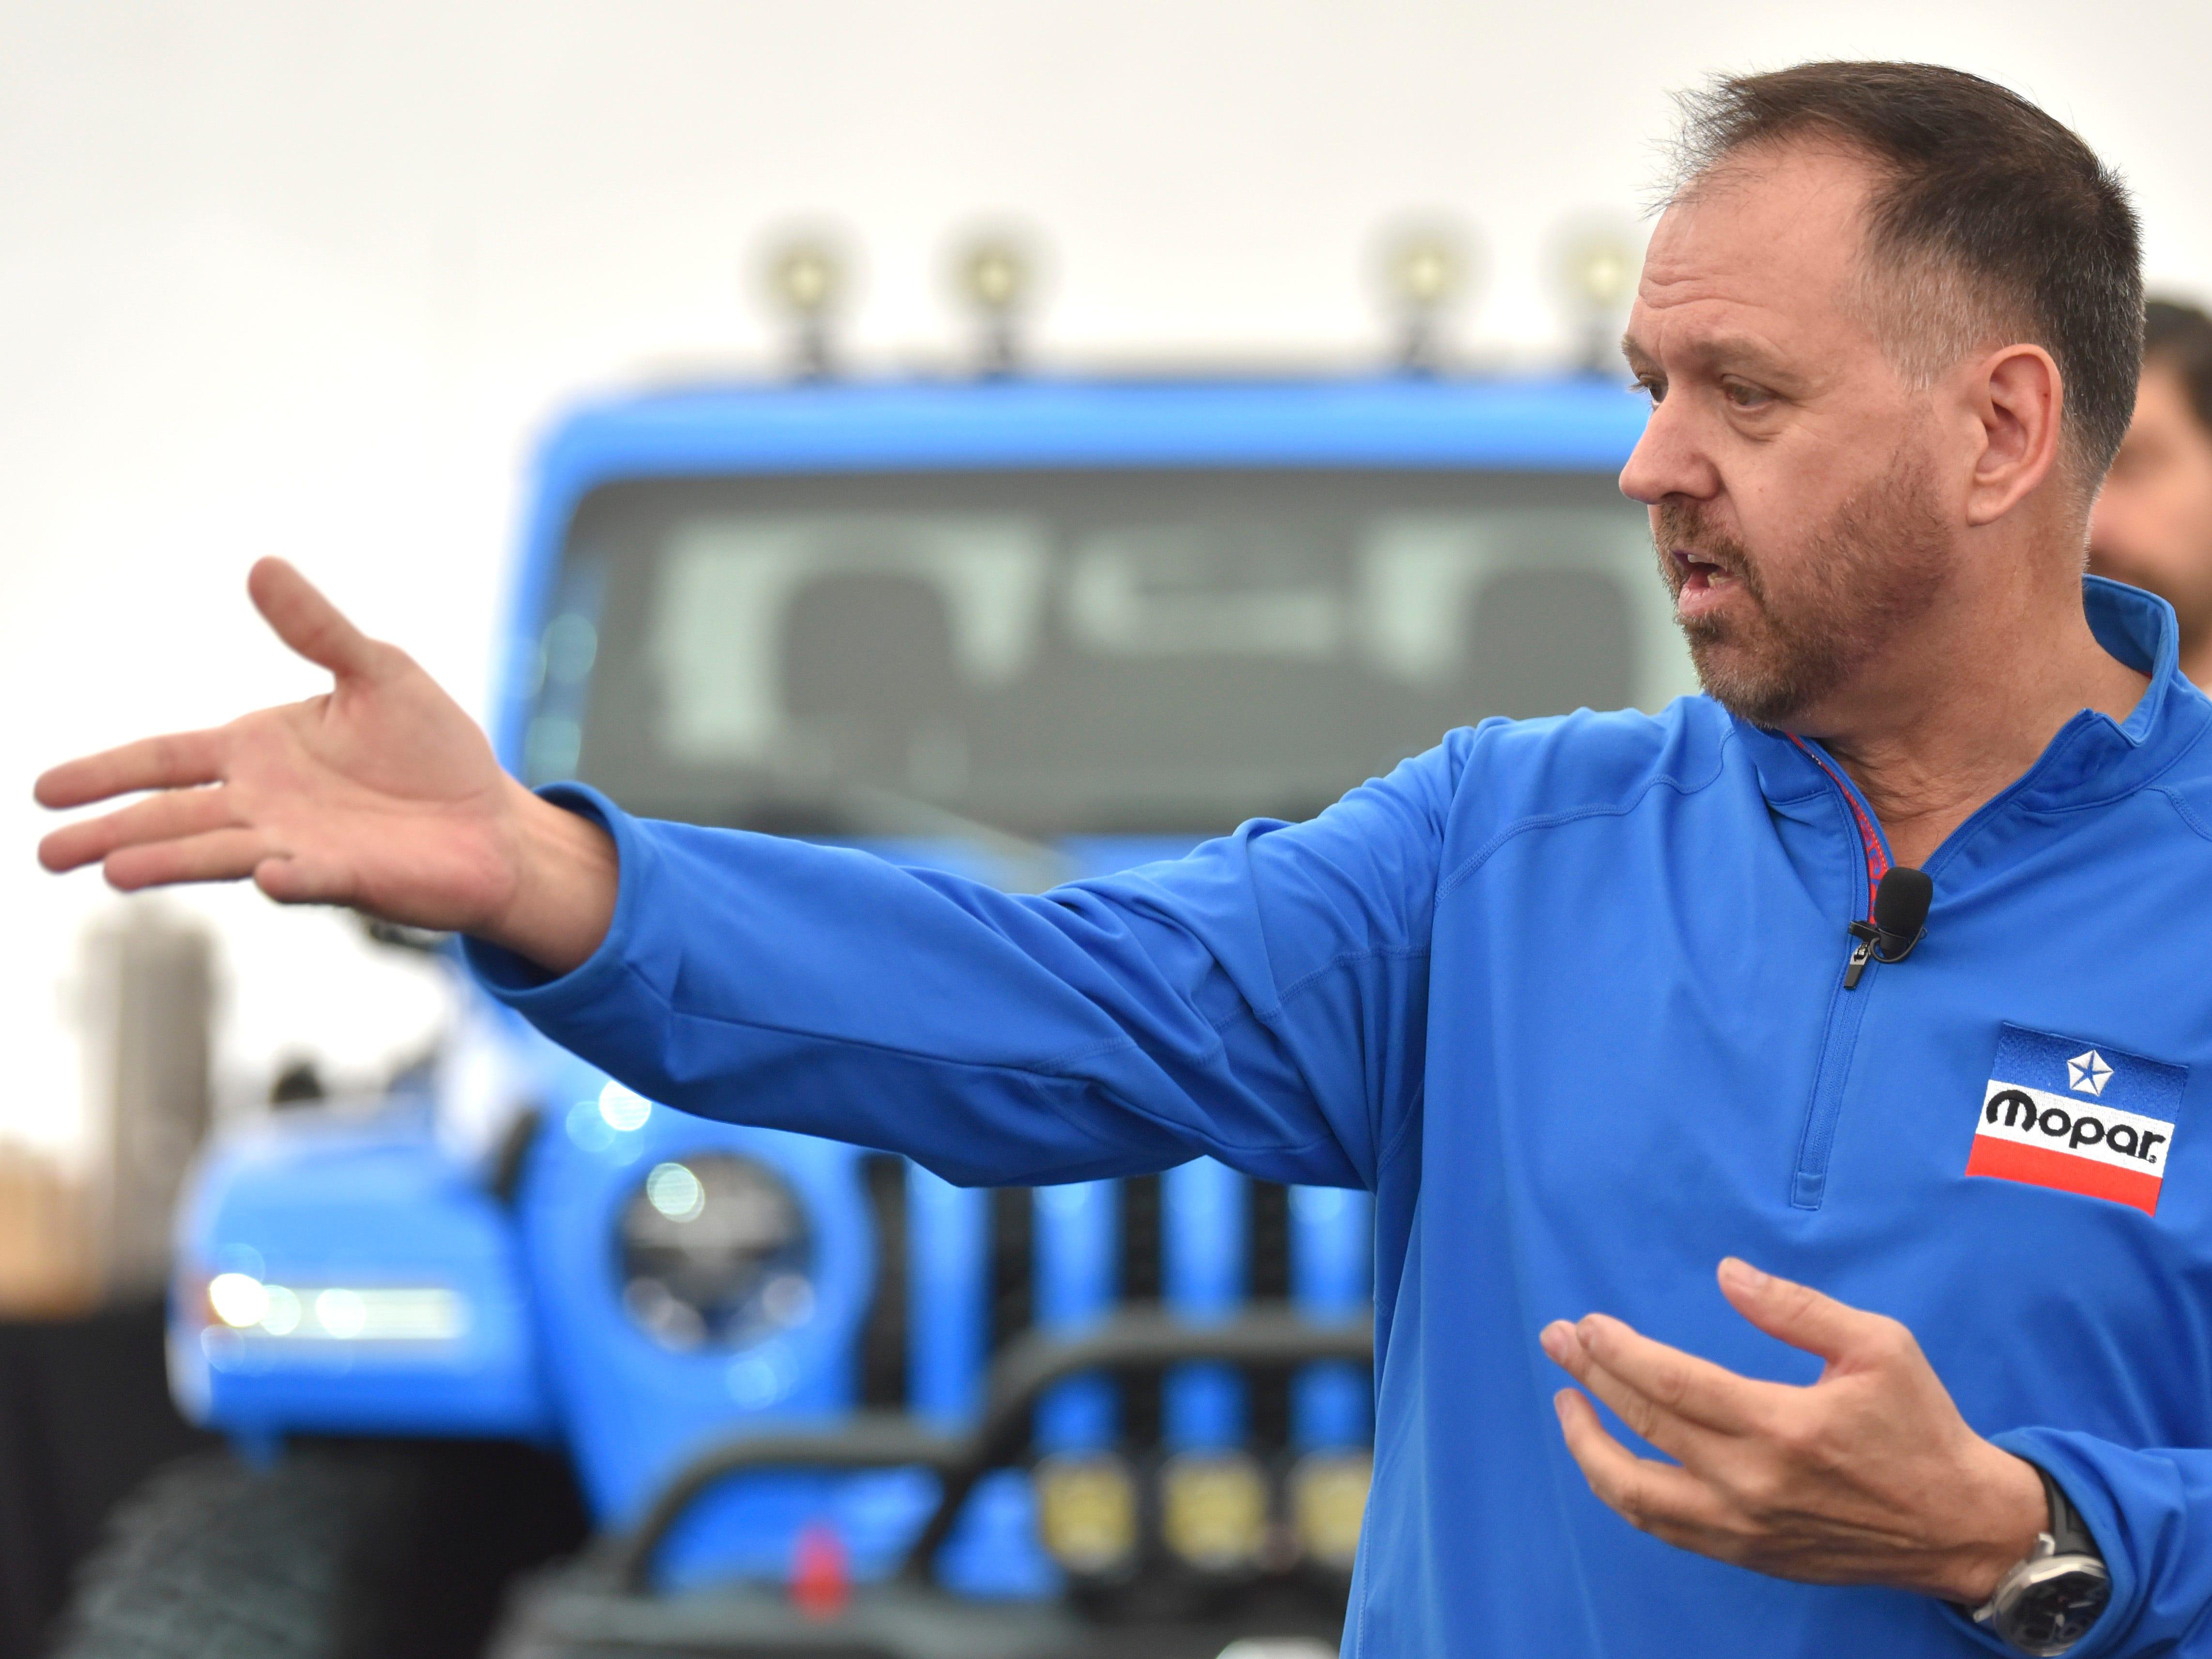 Joe Dehner, head of Ram & Mopar Design, speaks in front of the Jeep J6 concept in Brilliant Metallic Blue.